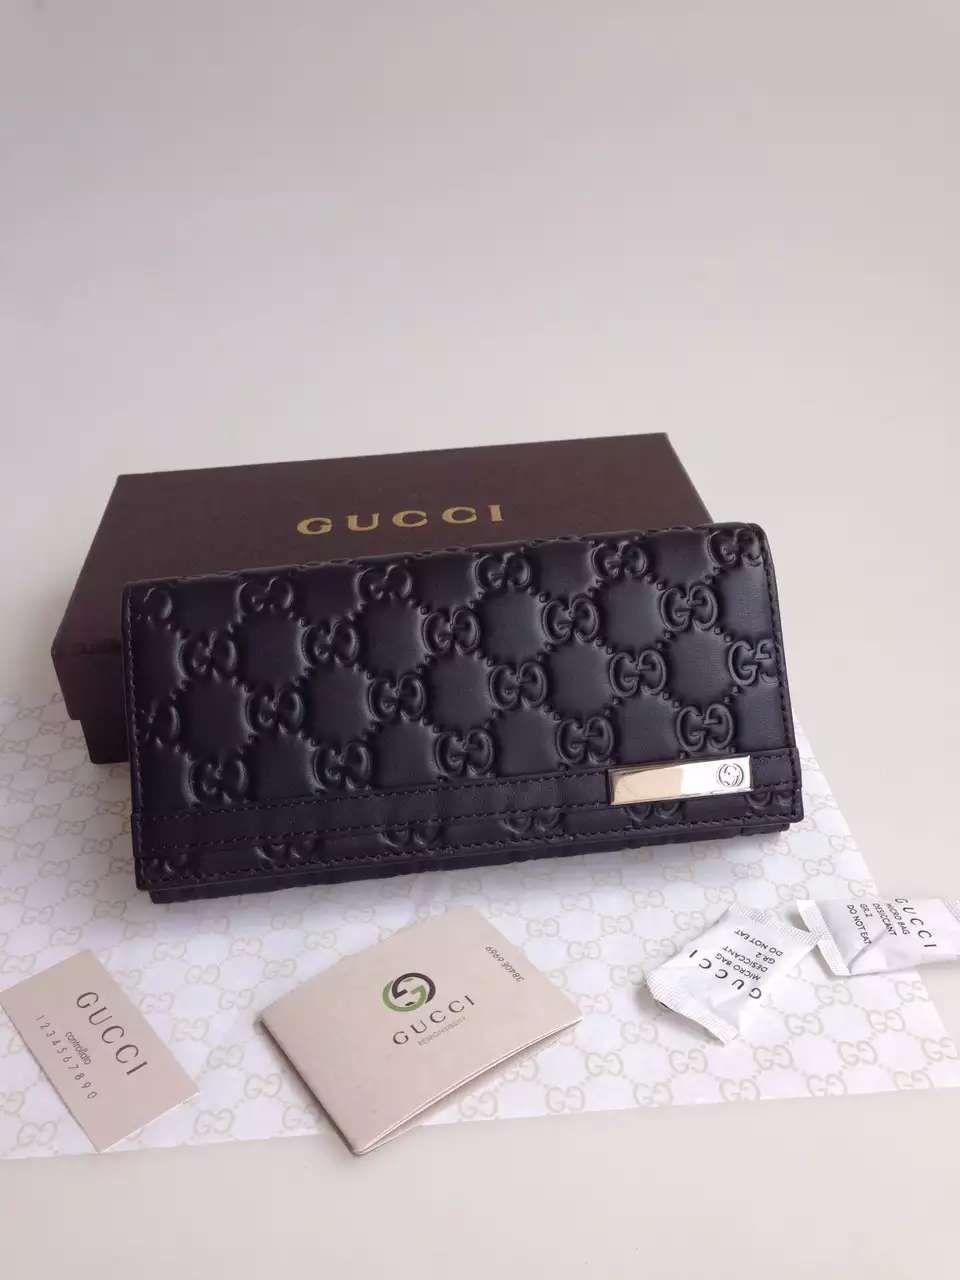 gucci Wallet, ID : 25937(FORSALE:a@yybags.com), gucci fashion shoes, gucci online shopping usa, gucci tw, gucci black tote, gucci executive briefcase, gucci velour, gucci cheap online, gucci billfold, gucci backpack shopping, gucci cloth, gucchi bags, gucci shop in melbourne, gucci for sale online, gucci black designer bags #gucciWallet #gucci #gucci #website #sale